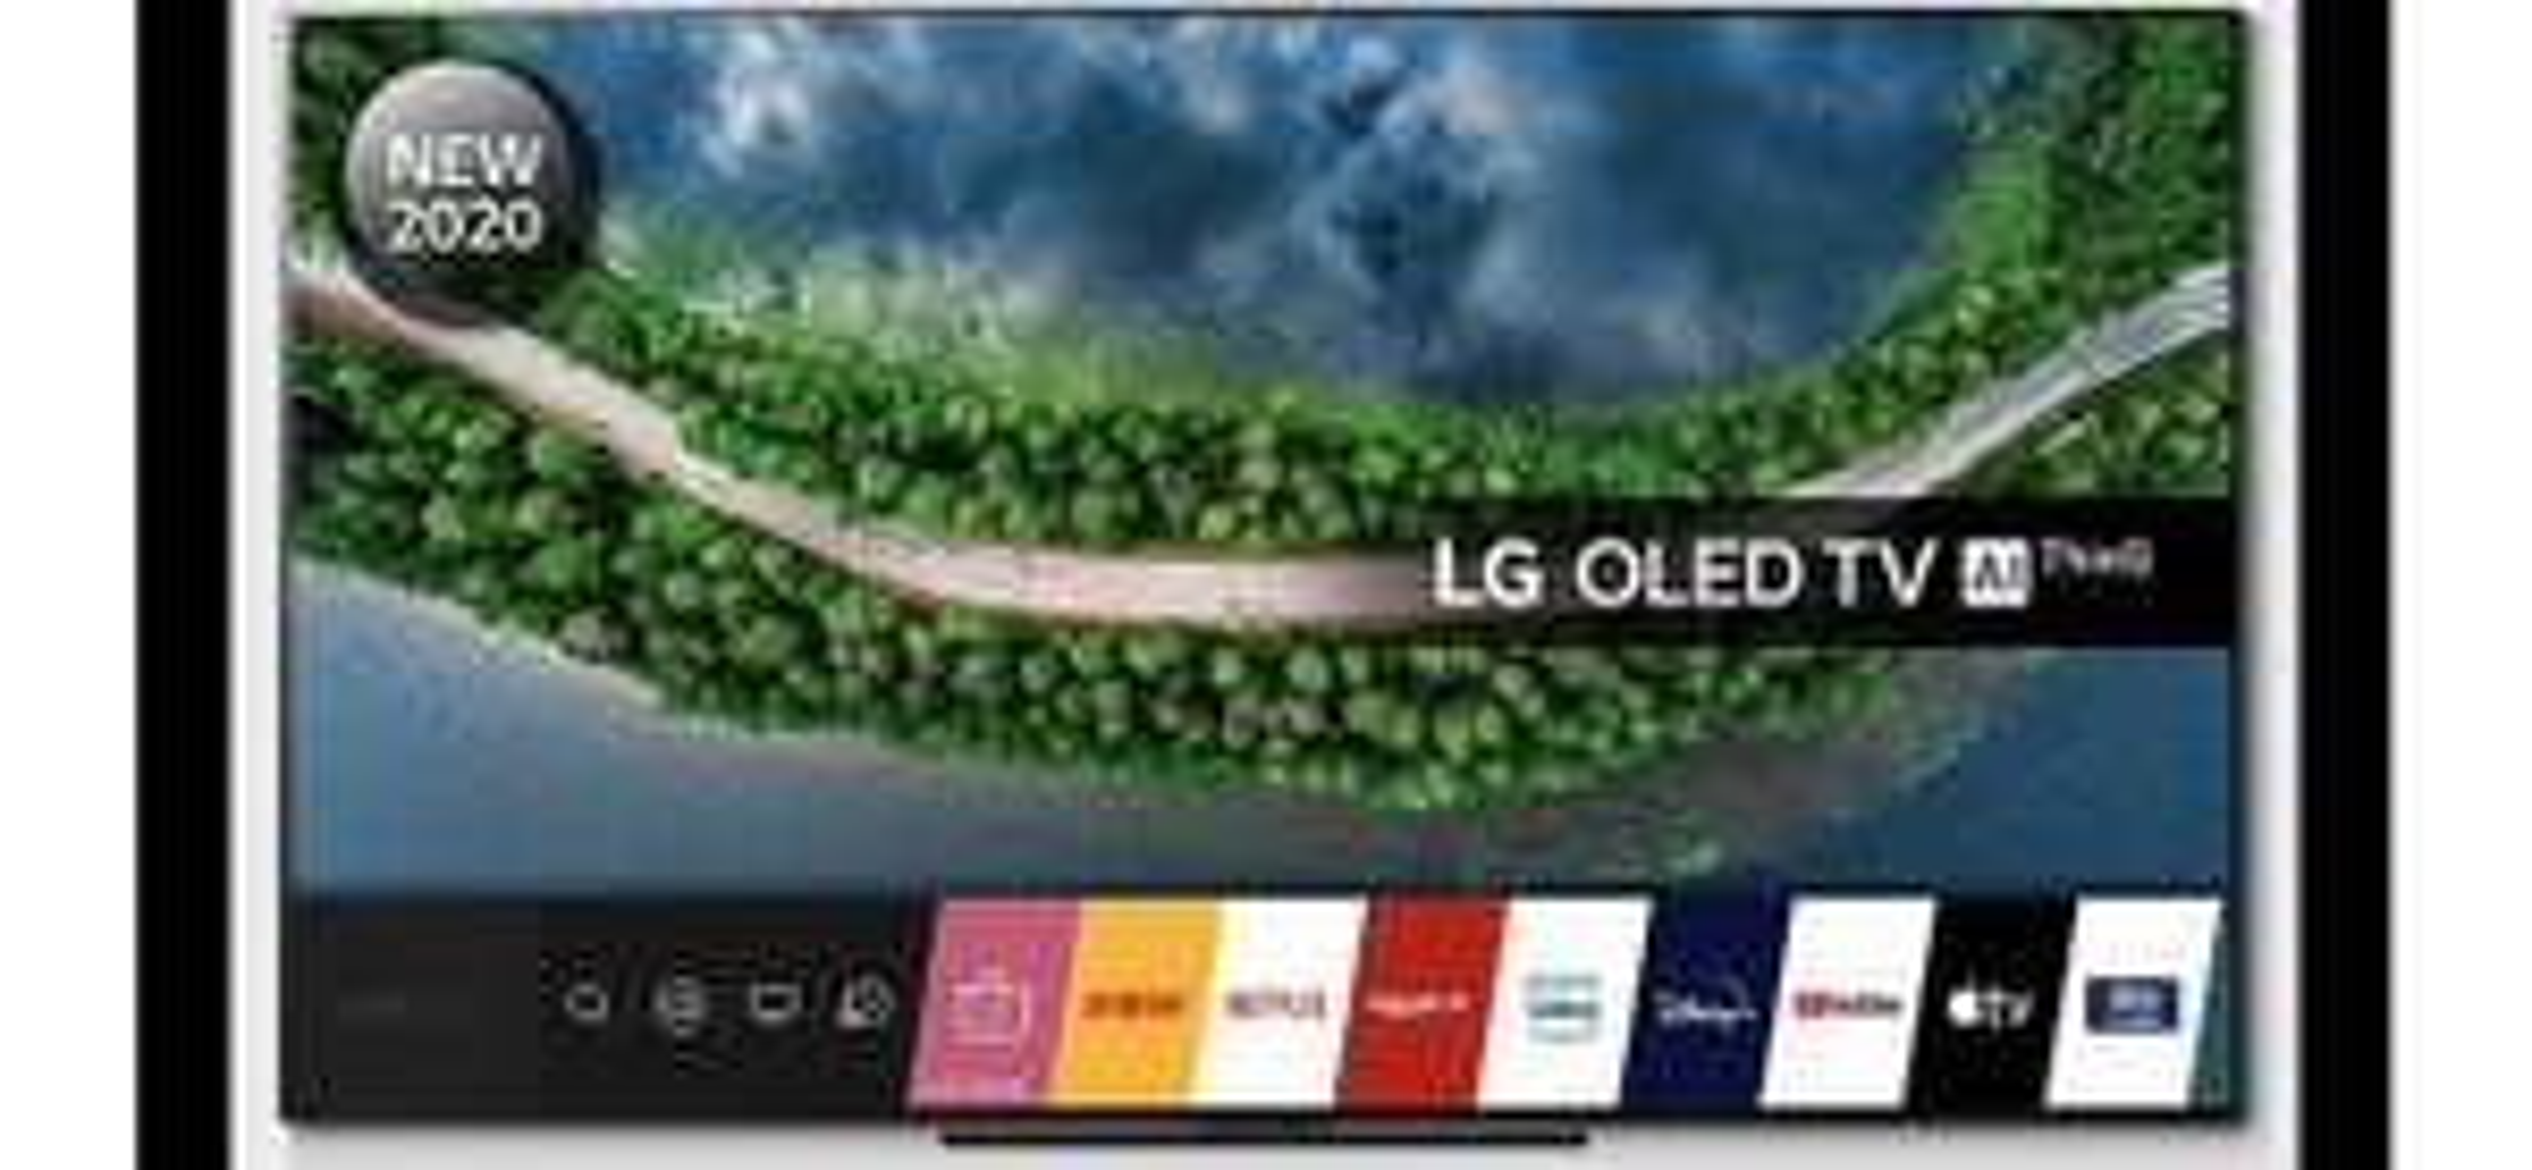 LG OLED55GX6LA 55inch Wall Mount OLED HDR 4K UHD SMART TV WiFi £1,299 at Electrical Discount UK